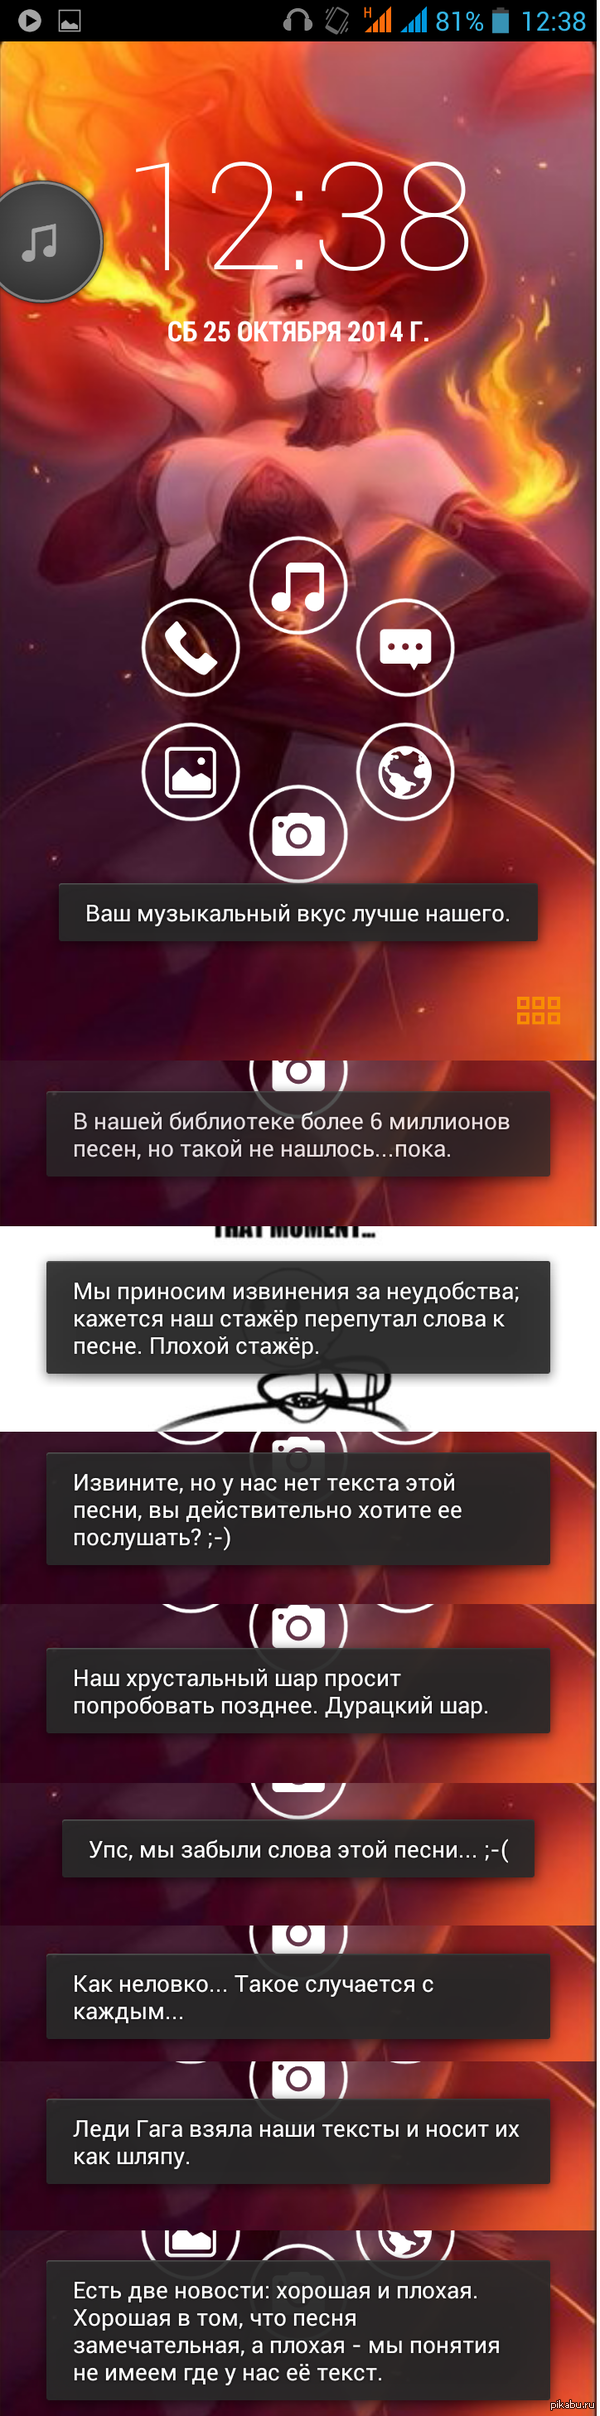 ������� � �������� ����� :D ������ �� ��������� MusiXMatch - FloatingLyrics, ��� ������ ������ �����, ������� ������ � ������ PowerAMP. ������ ������ � ��� ��� ���������)  android, ����������, musixmatch, poweramp, ������������